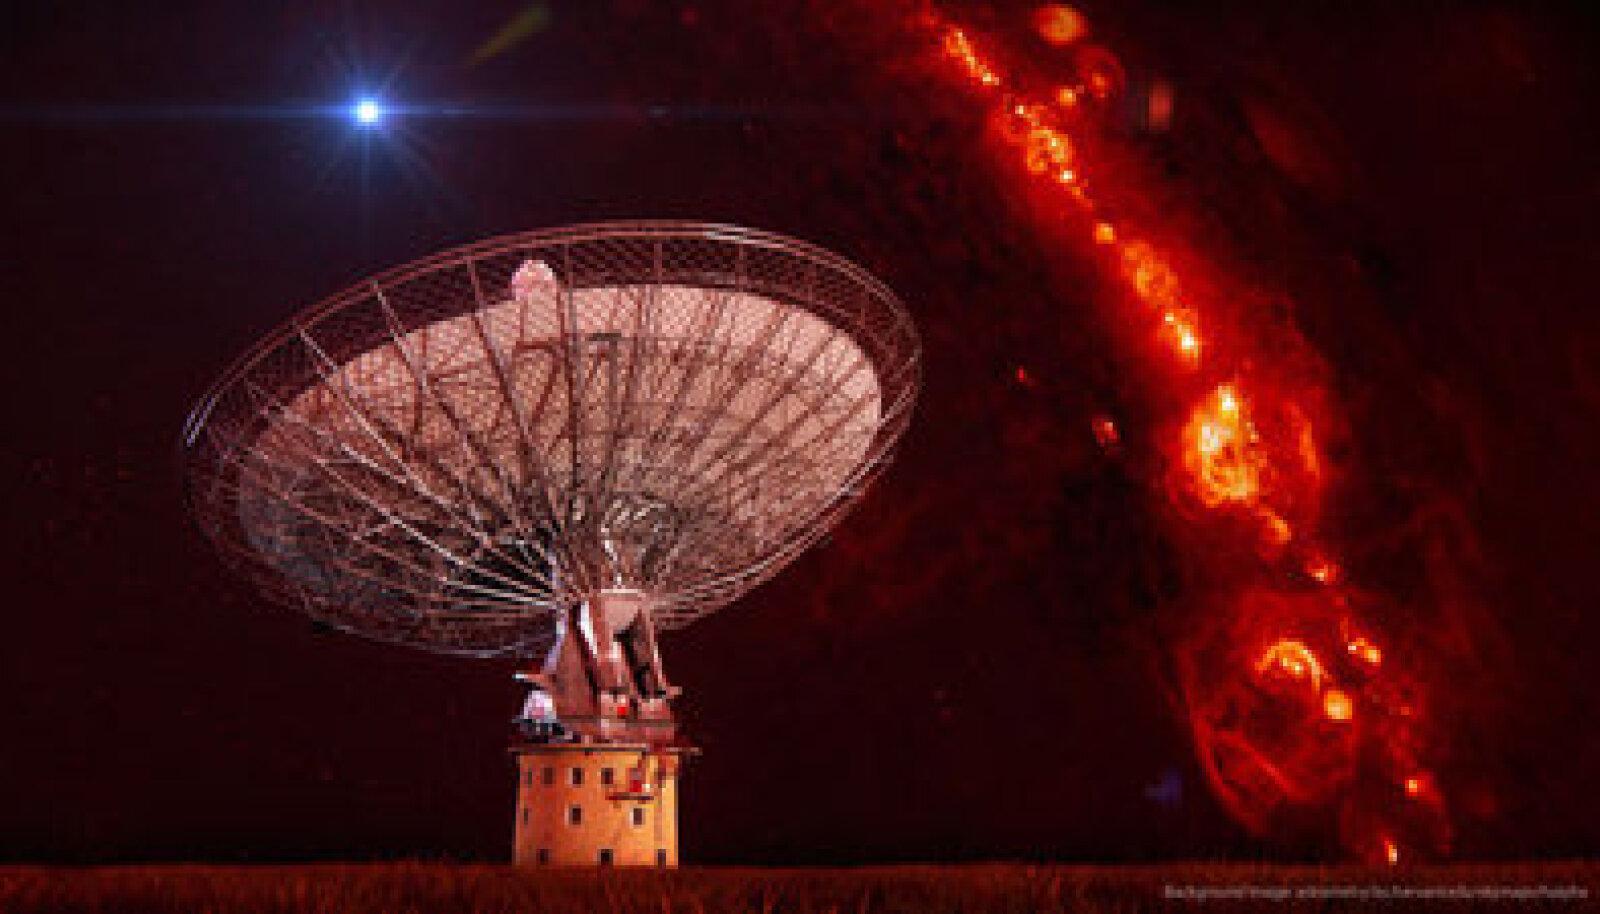 CSIRO's Parkesi raadioteleskoop. Swinburne Astronomy Productions